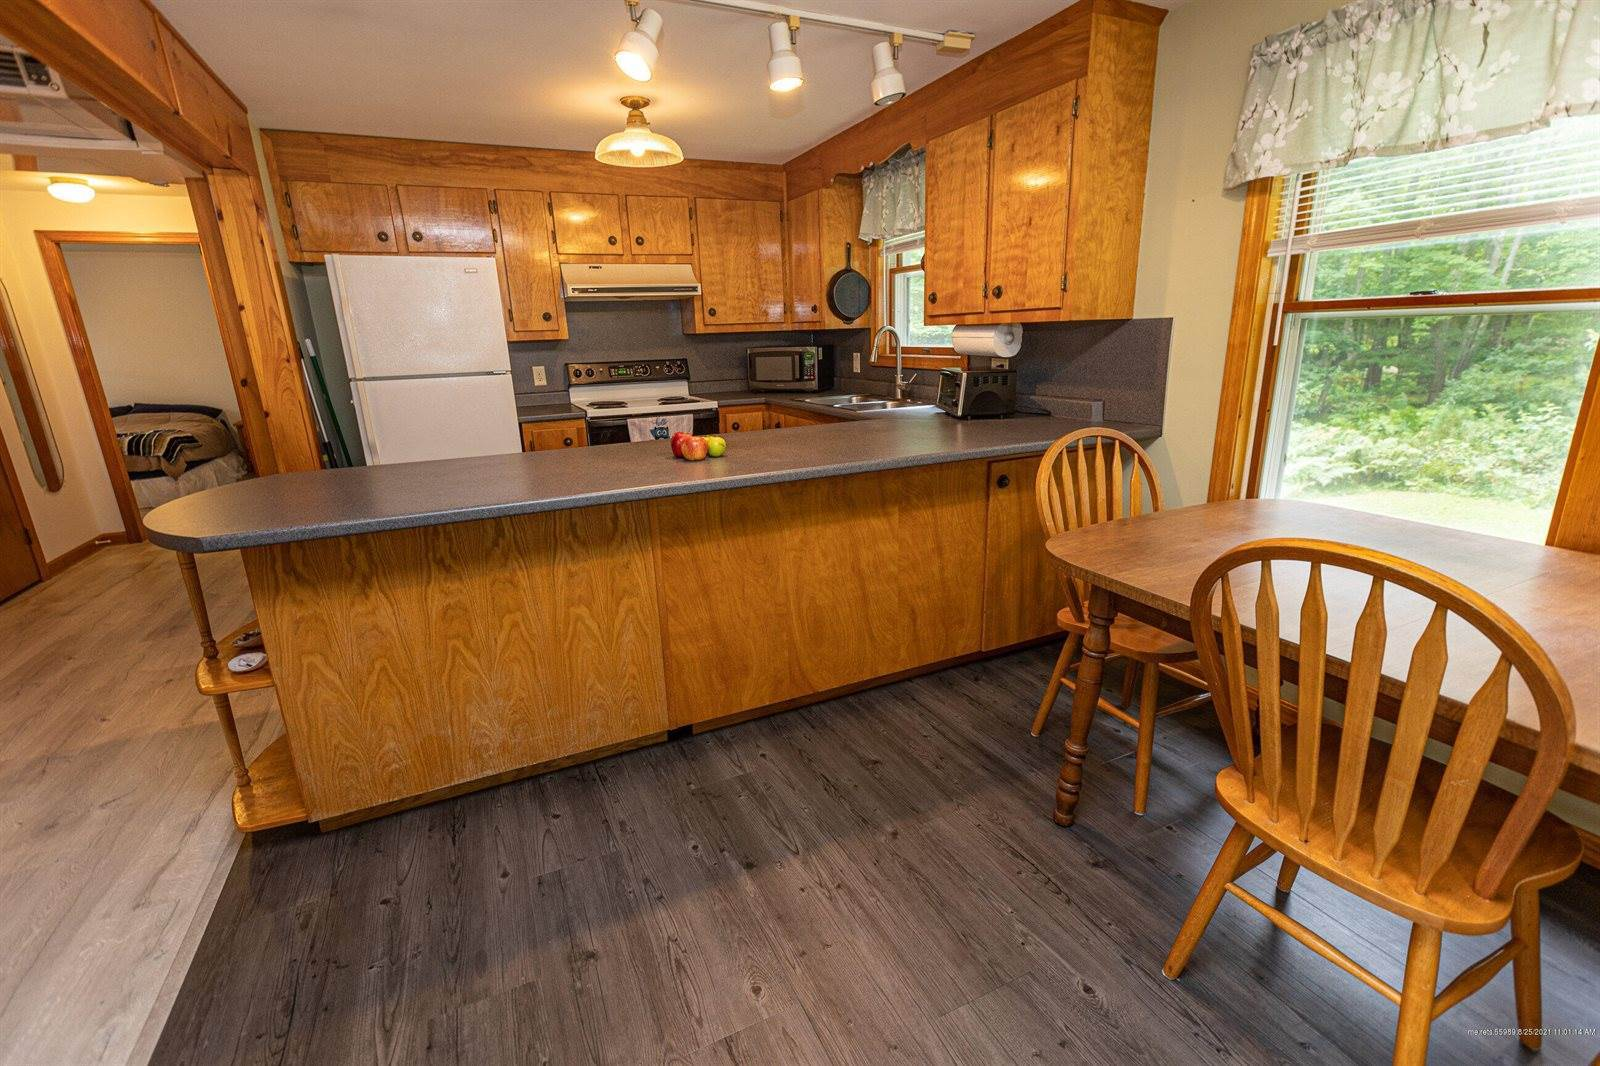 62 Roosevelt Trail, Windham, ME 04062